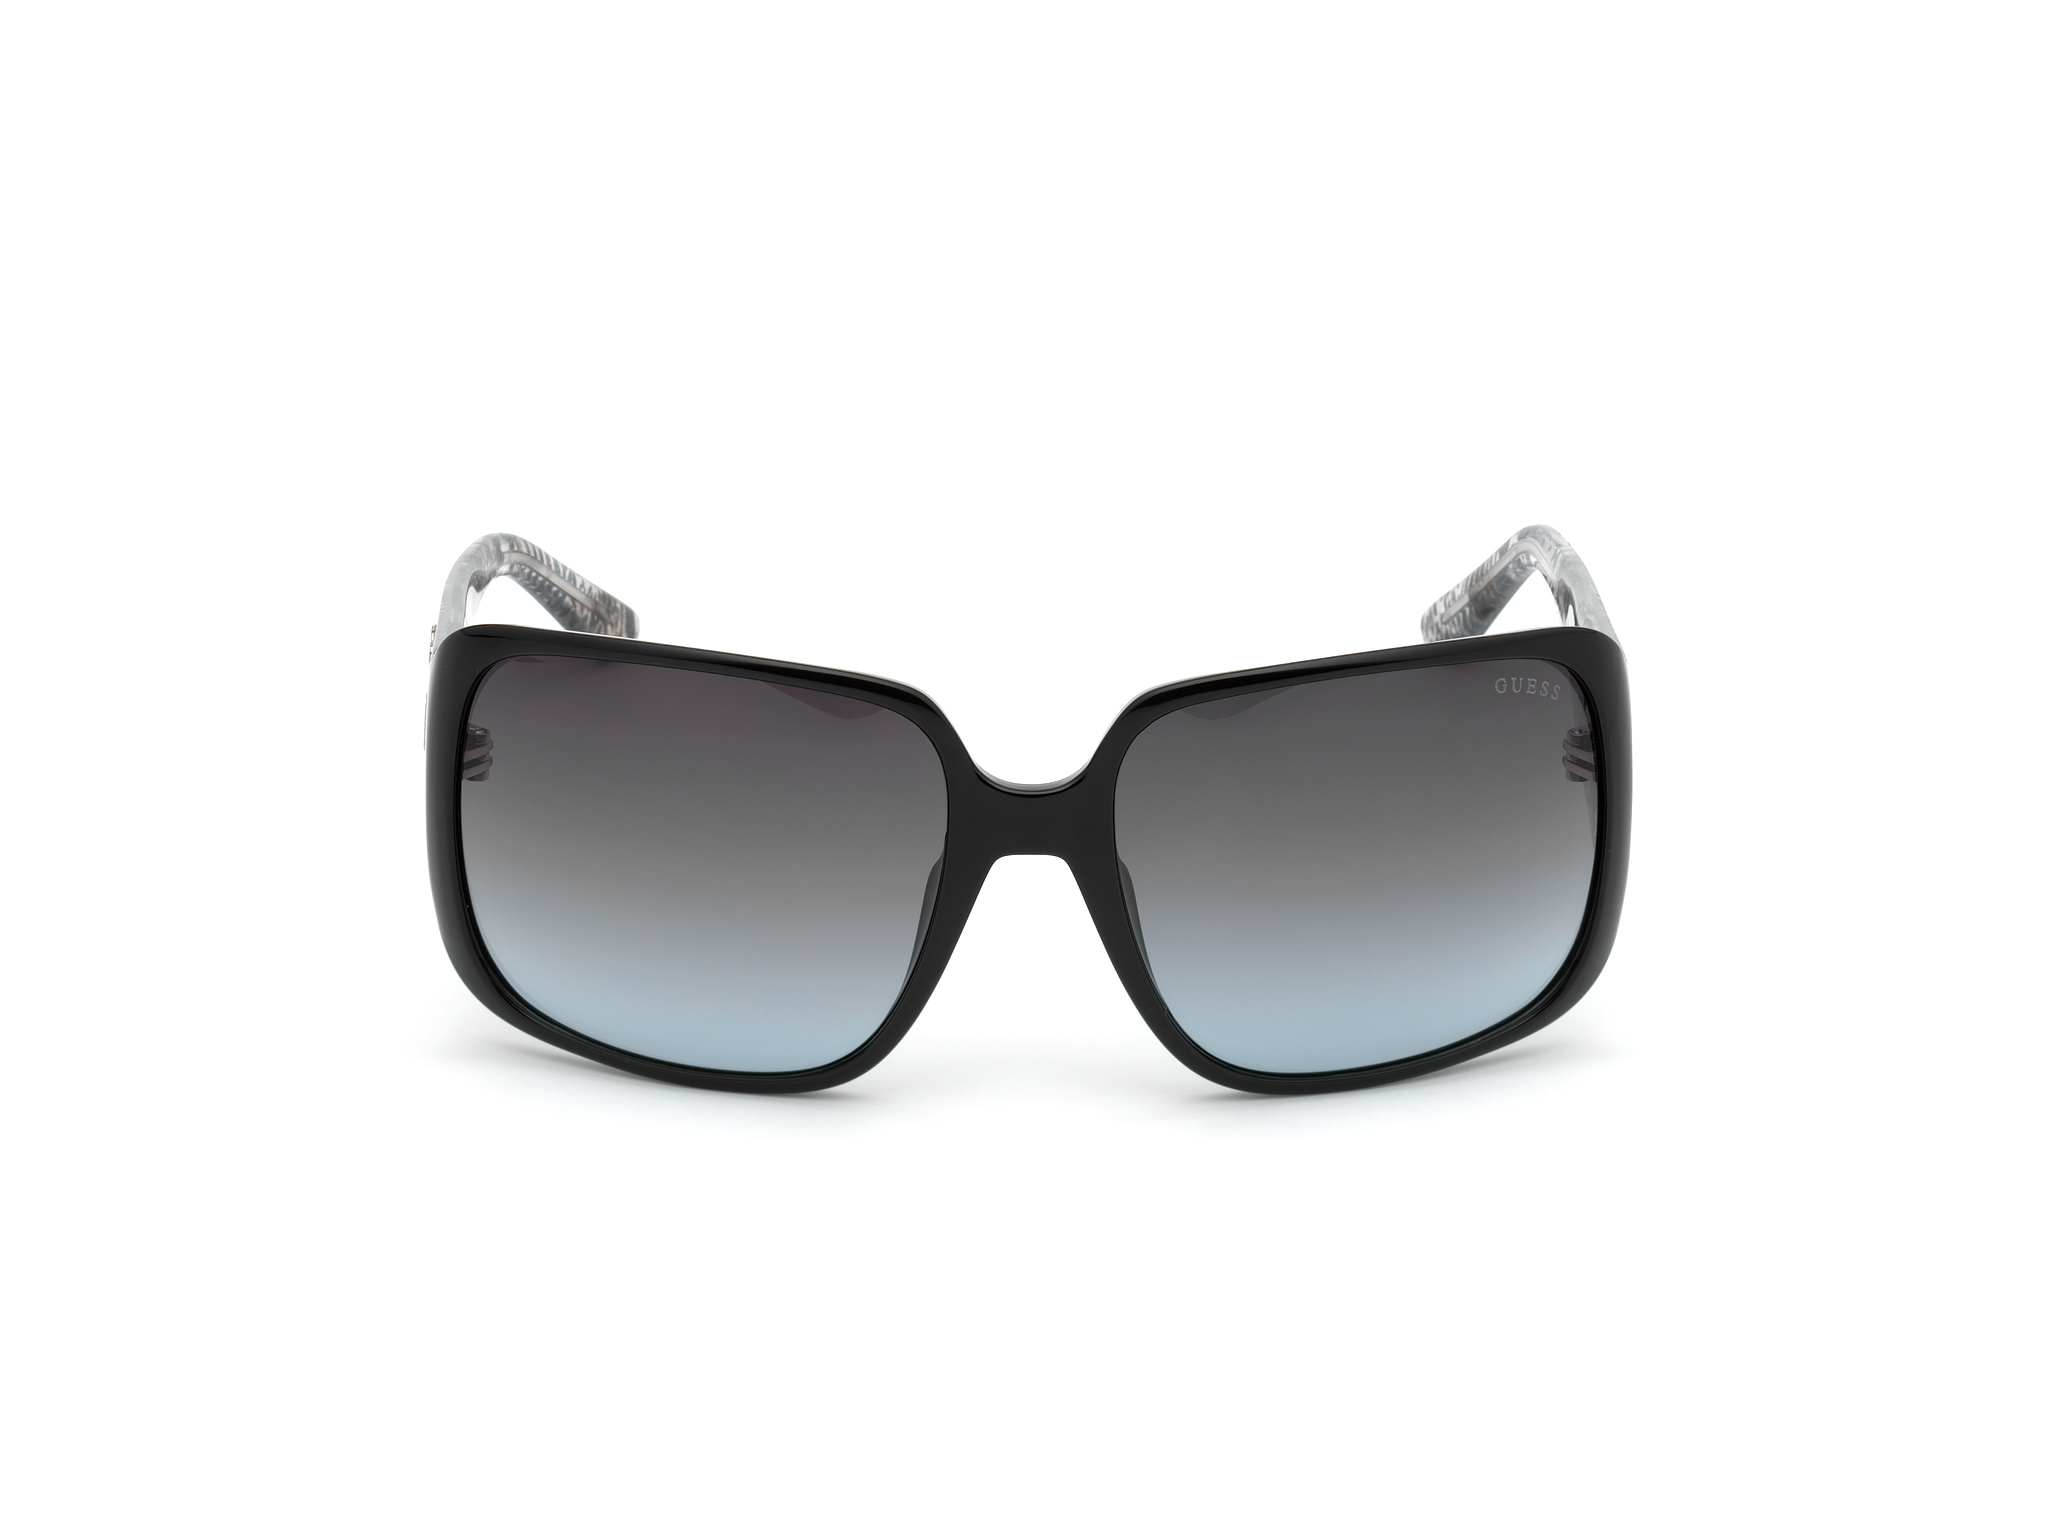 GUESS | Guess Black Frame With Grey Lens Shield Shape Women Sunglass